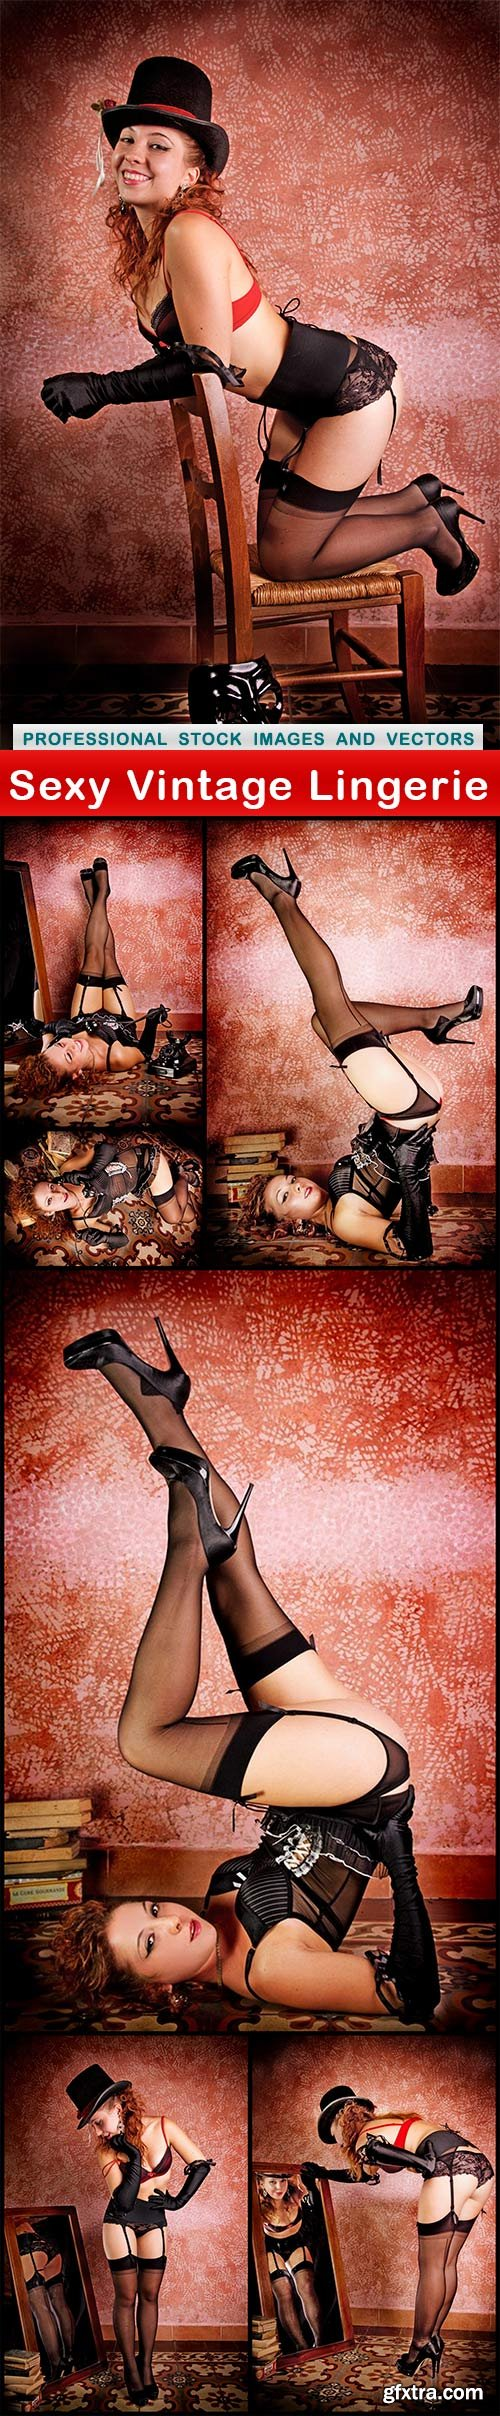 Sexy Vintage Lingerie - 7 UHQ JPEG